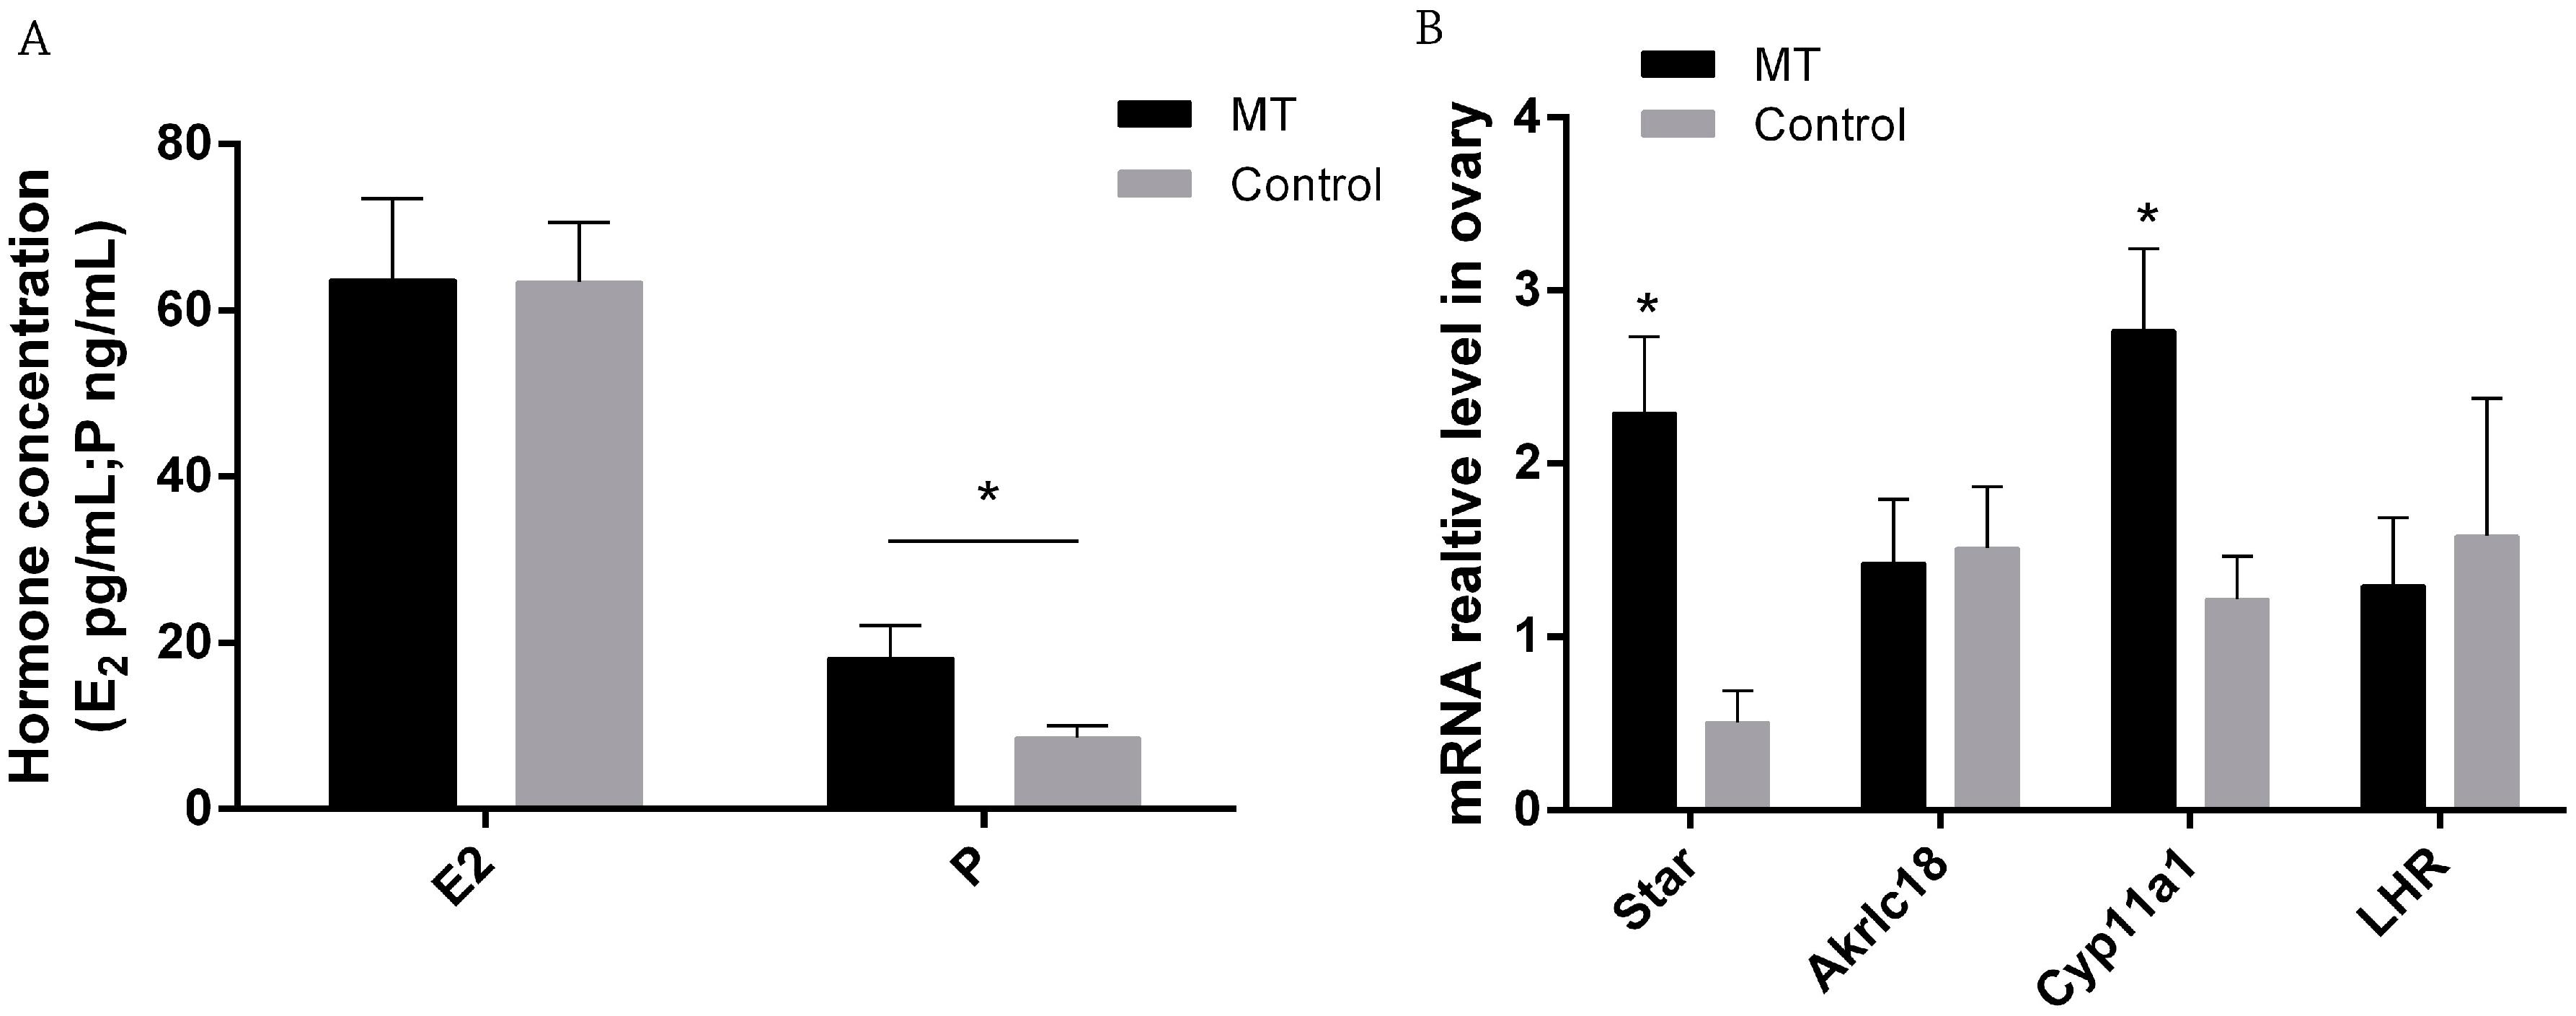 IJMS | Free Full-Text | Effects of Melatonin on Early